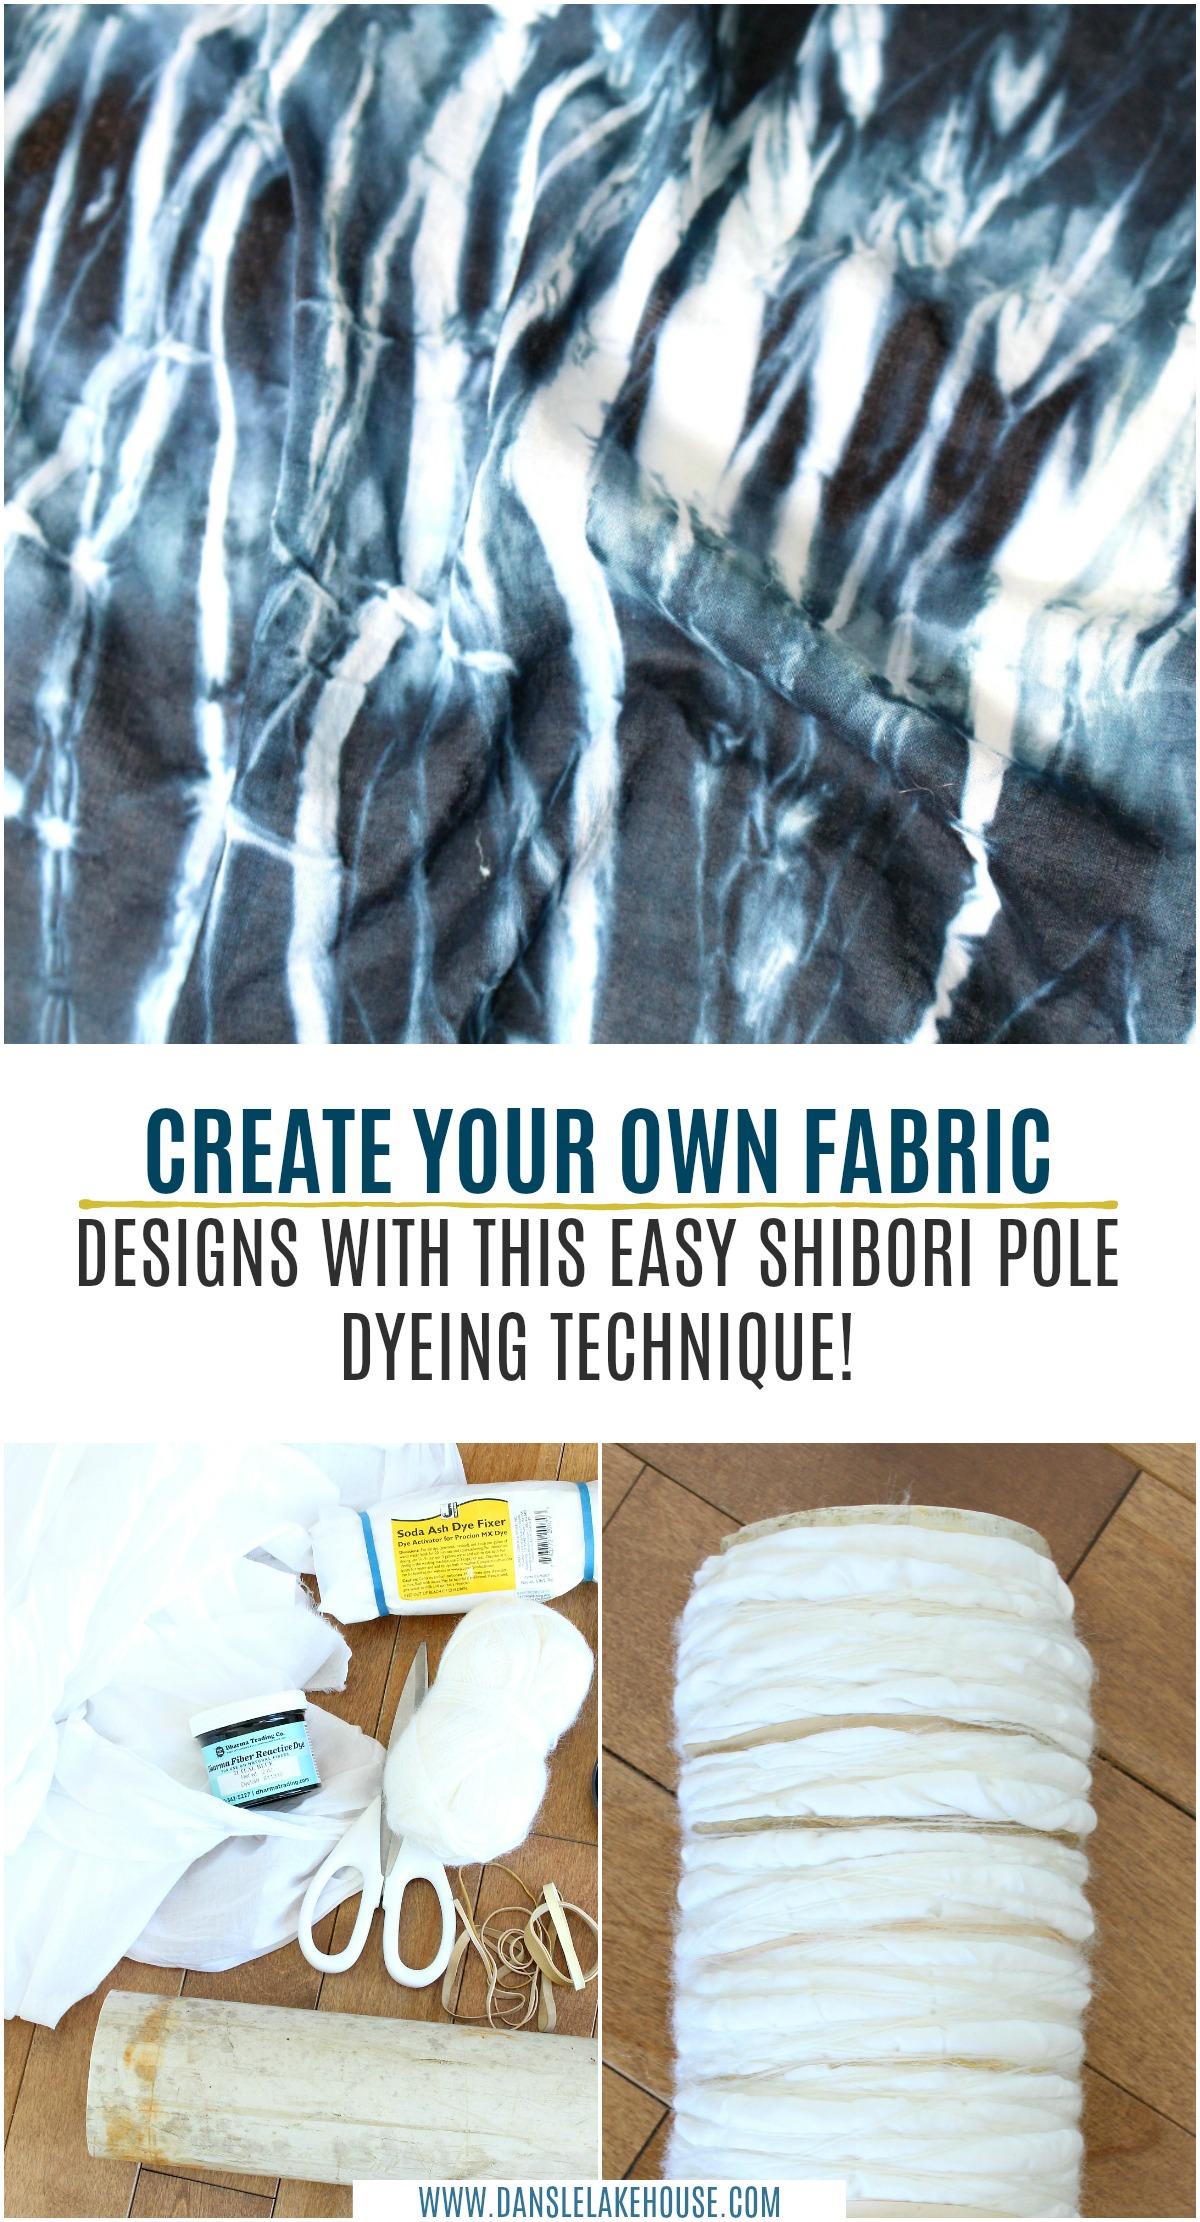 DIY Shibori Technique